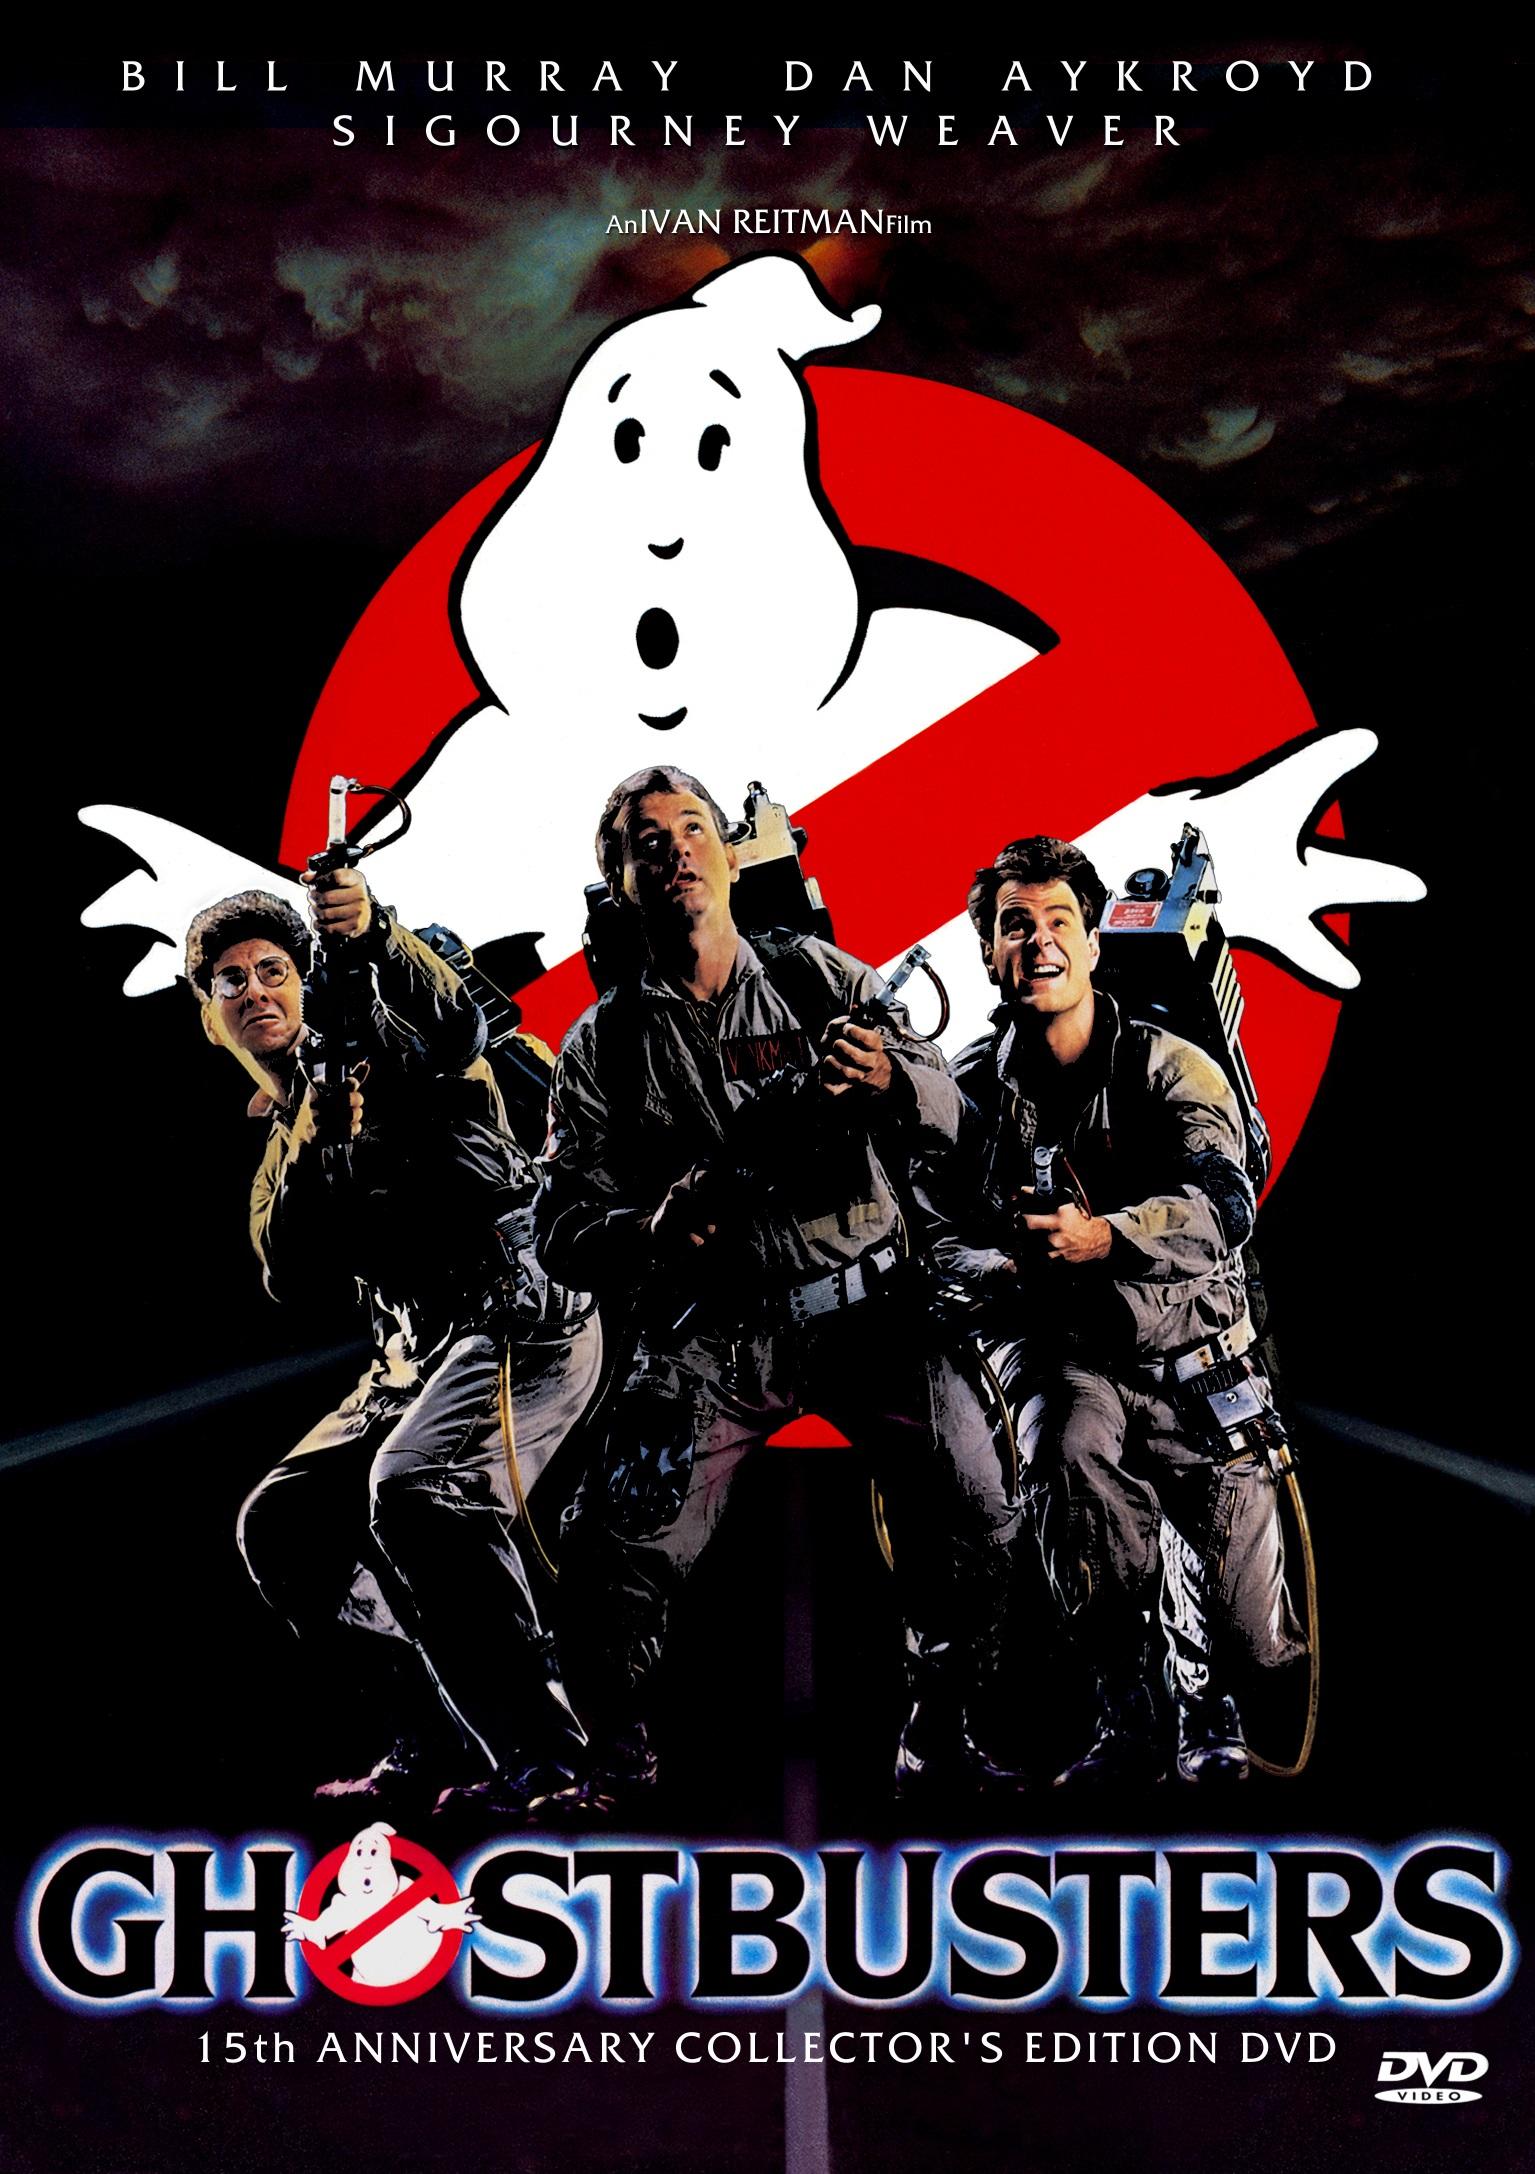 'Ghostbusters': Something strange, and wonderfully